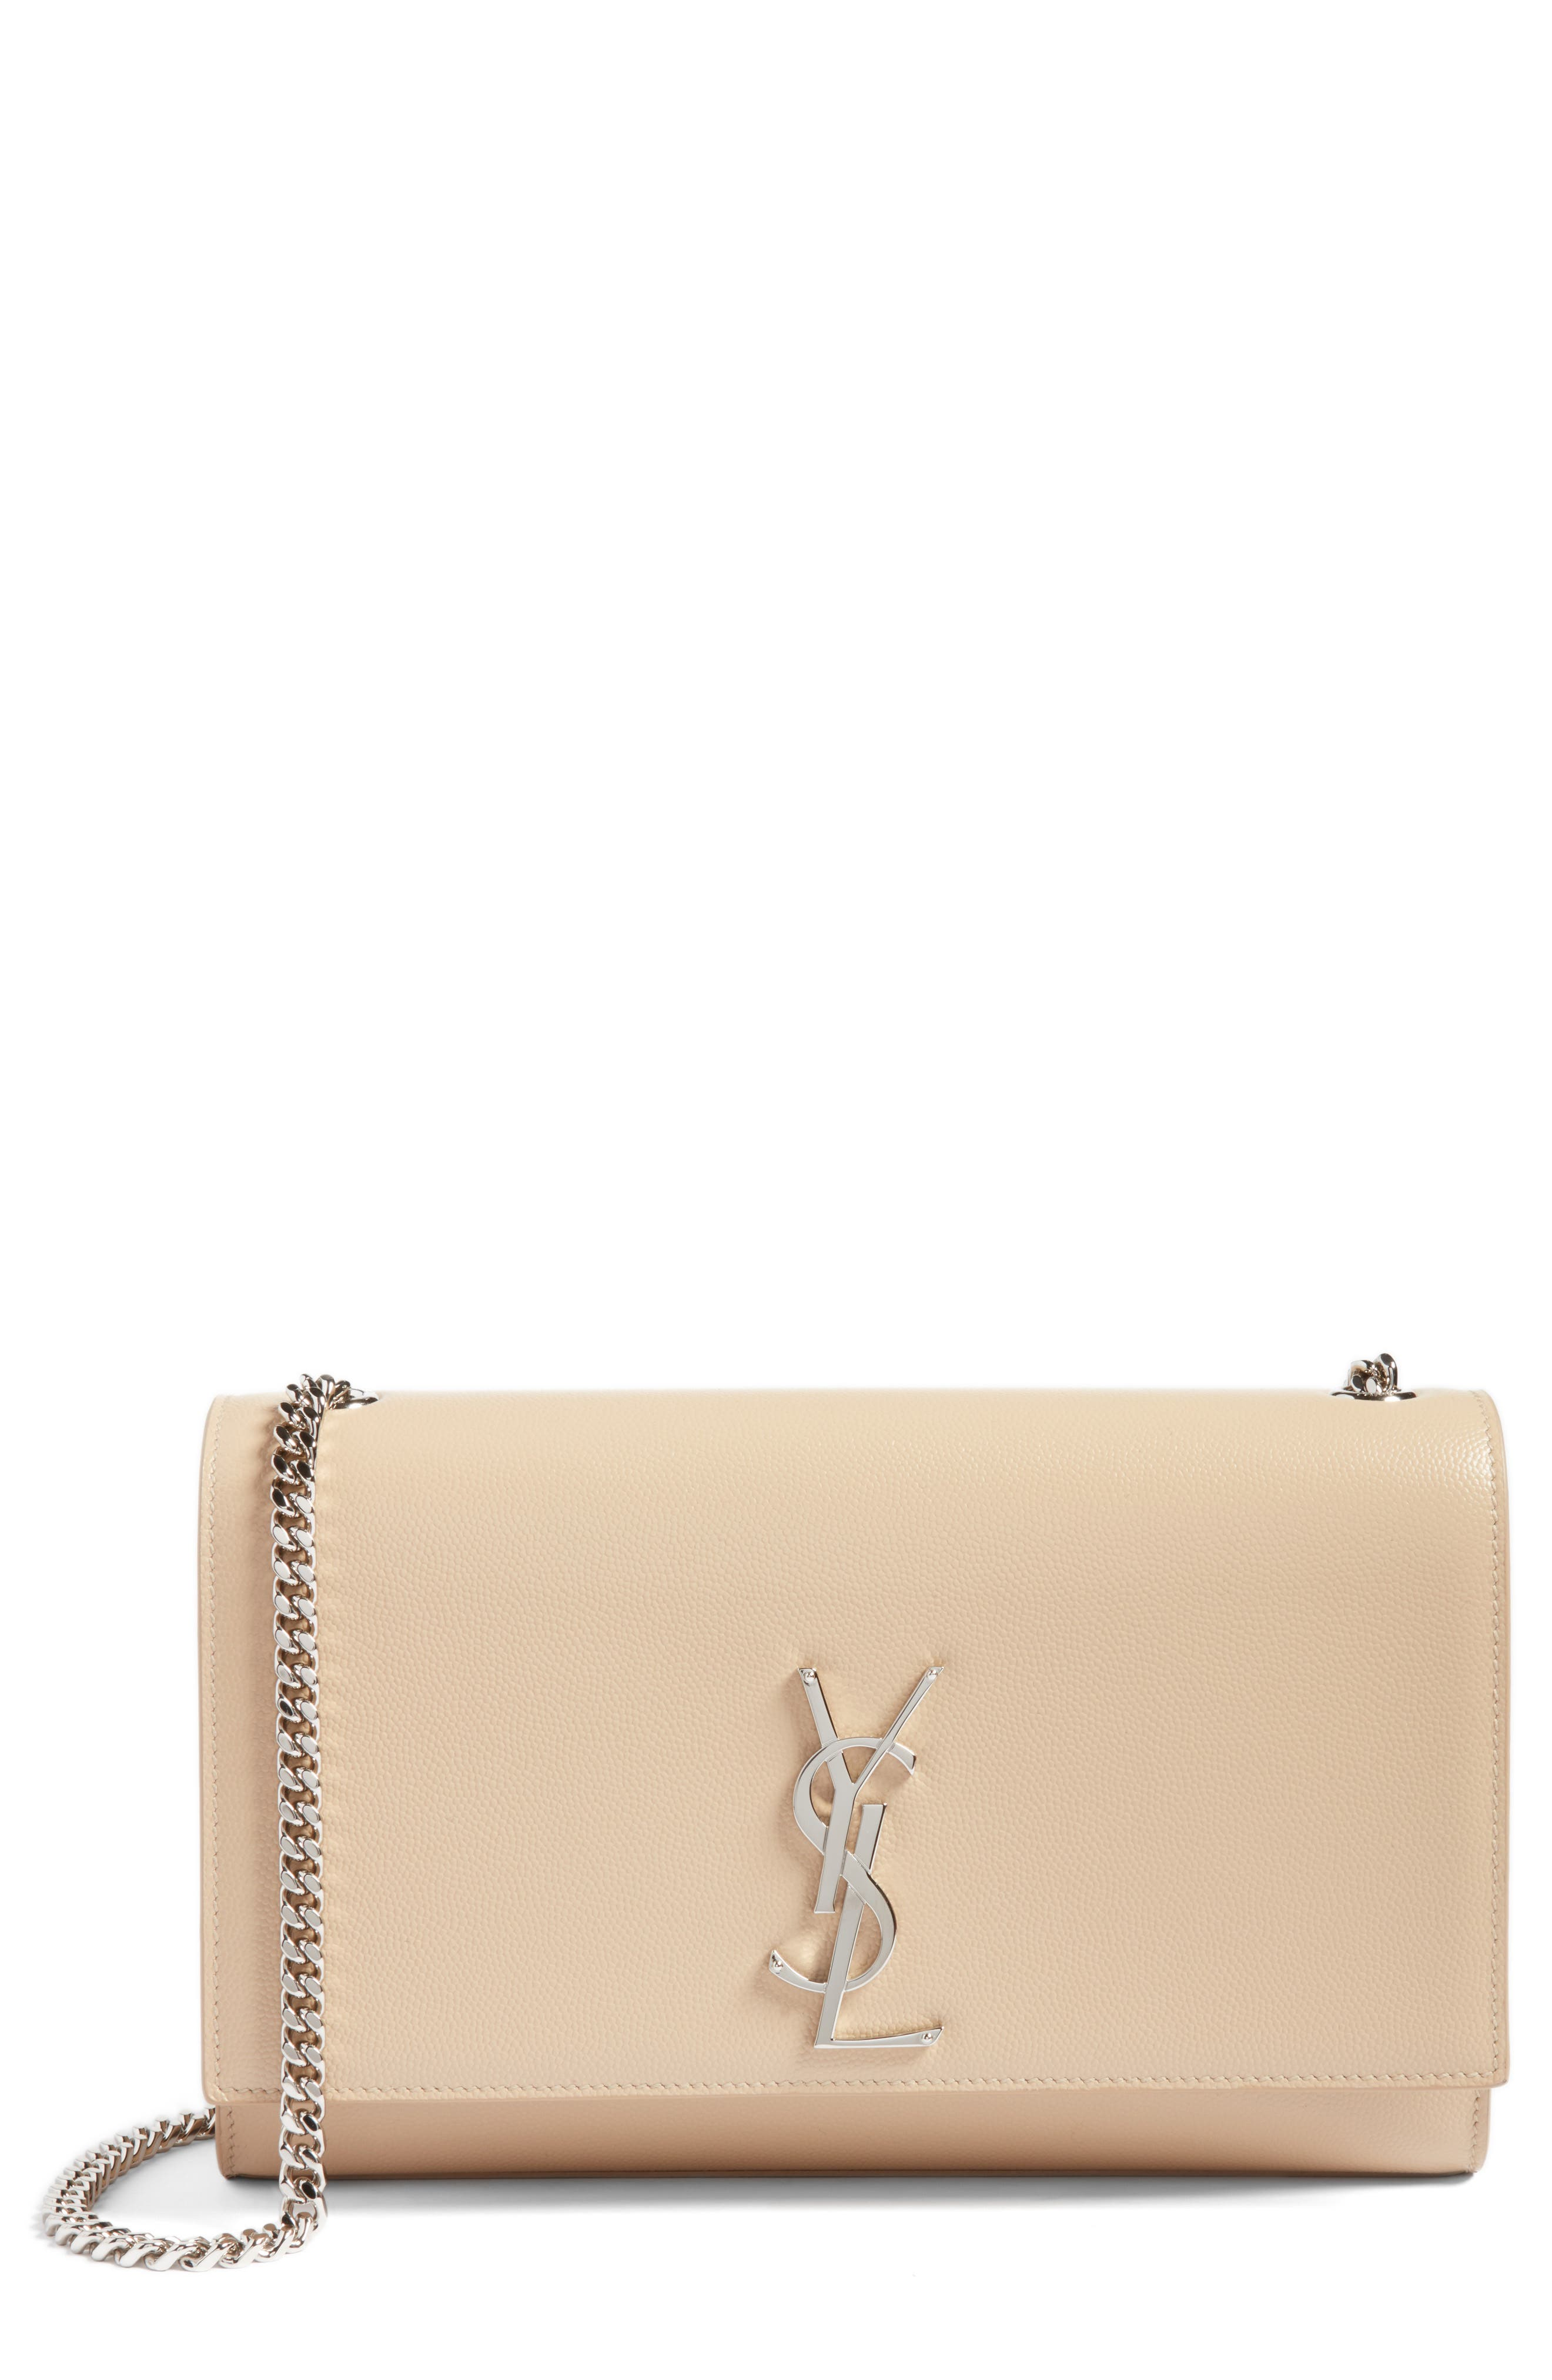 Saint Laurent Medium Kate Calfskin Leather Wallet on a Chain